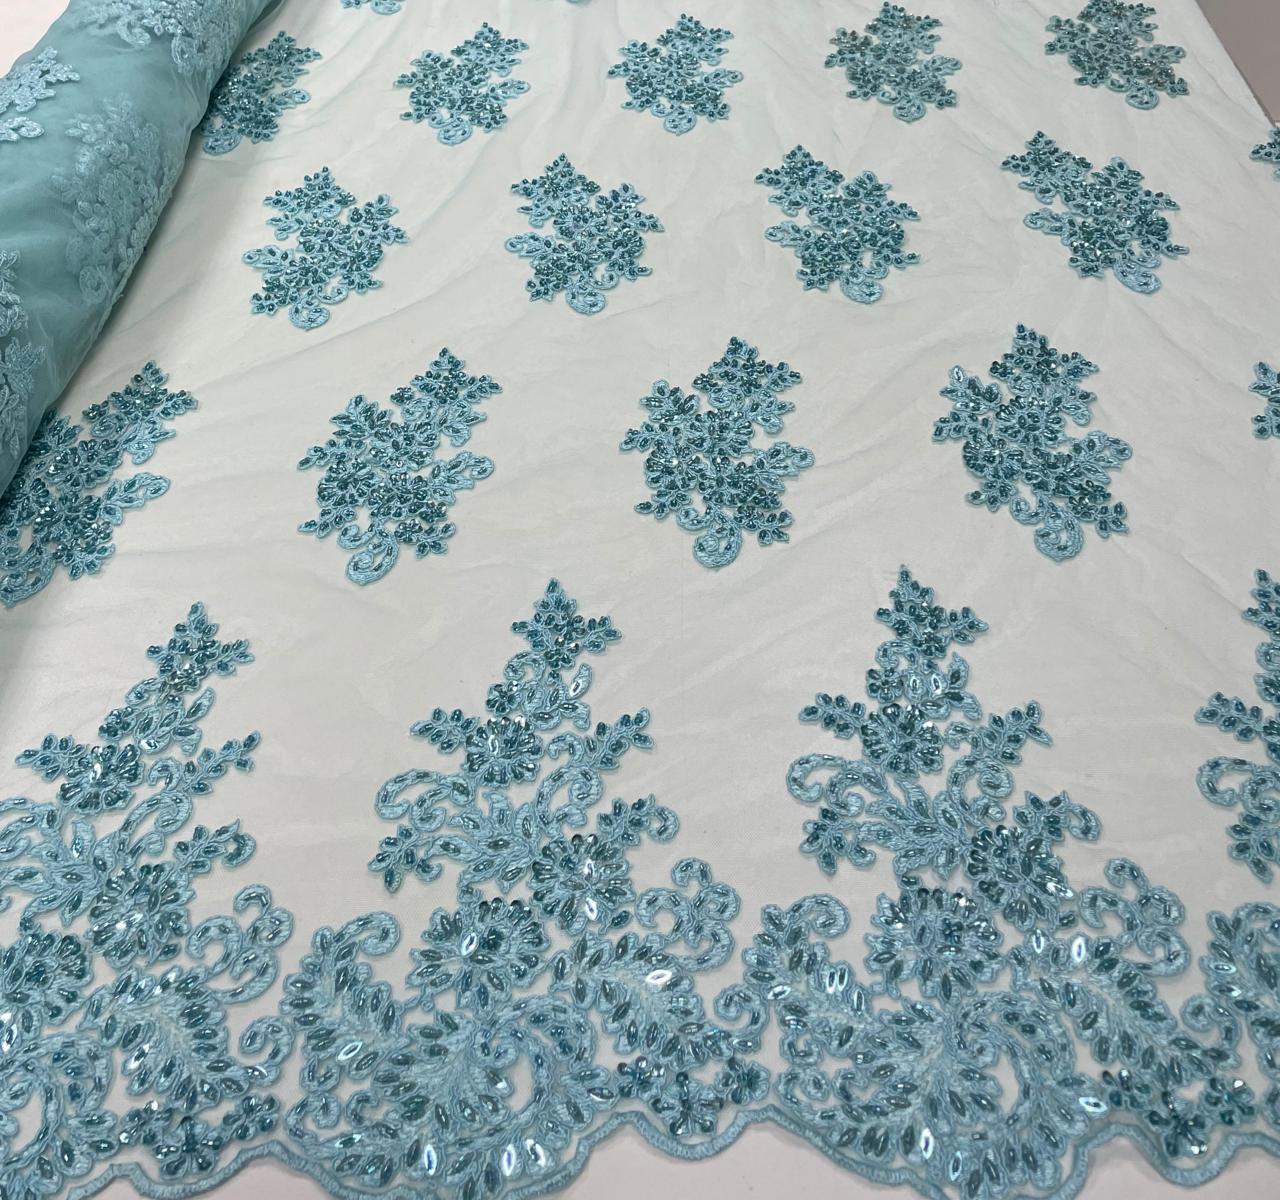 Tule Bordado Azul Piscina com Pedrarias Modelo 02